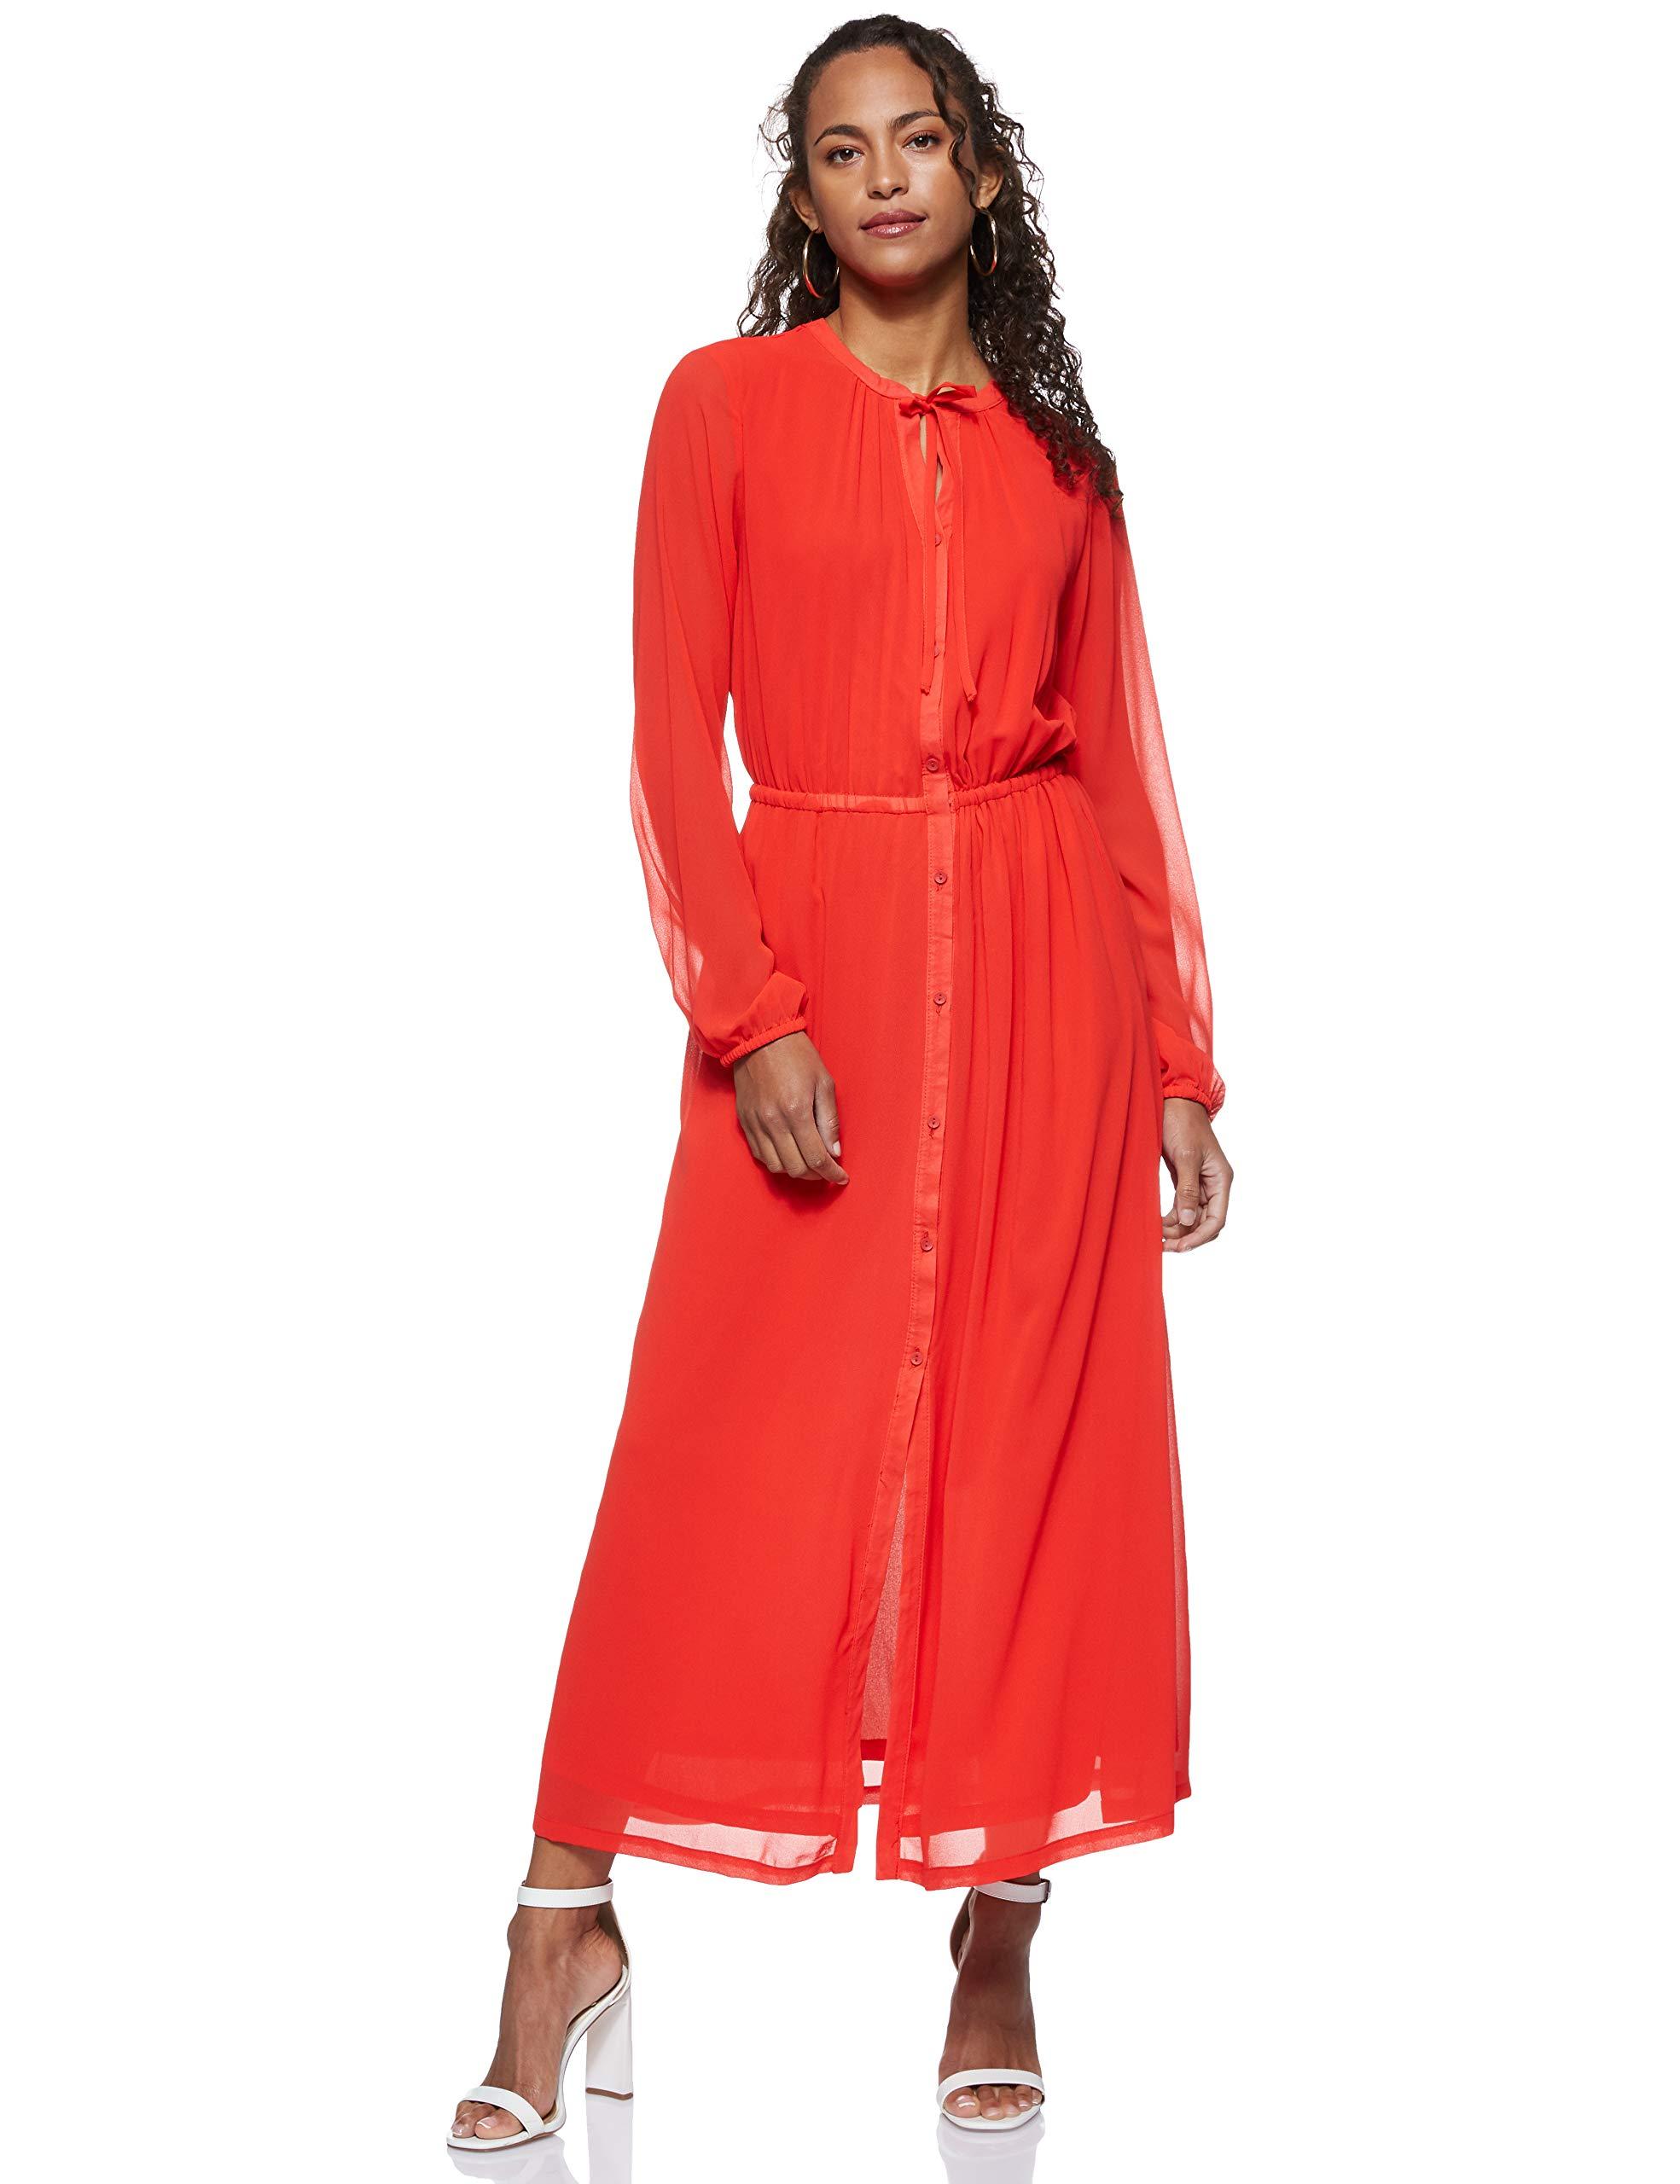 Only Women's 15173850 Dress